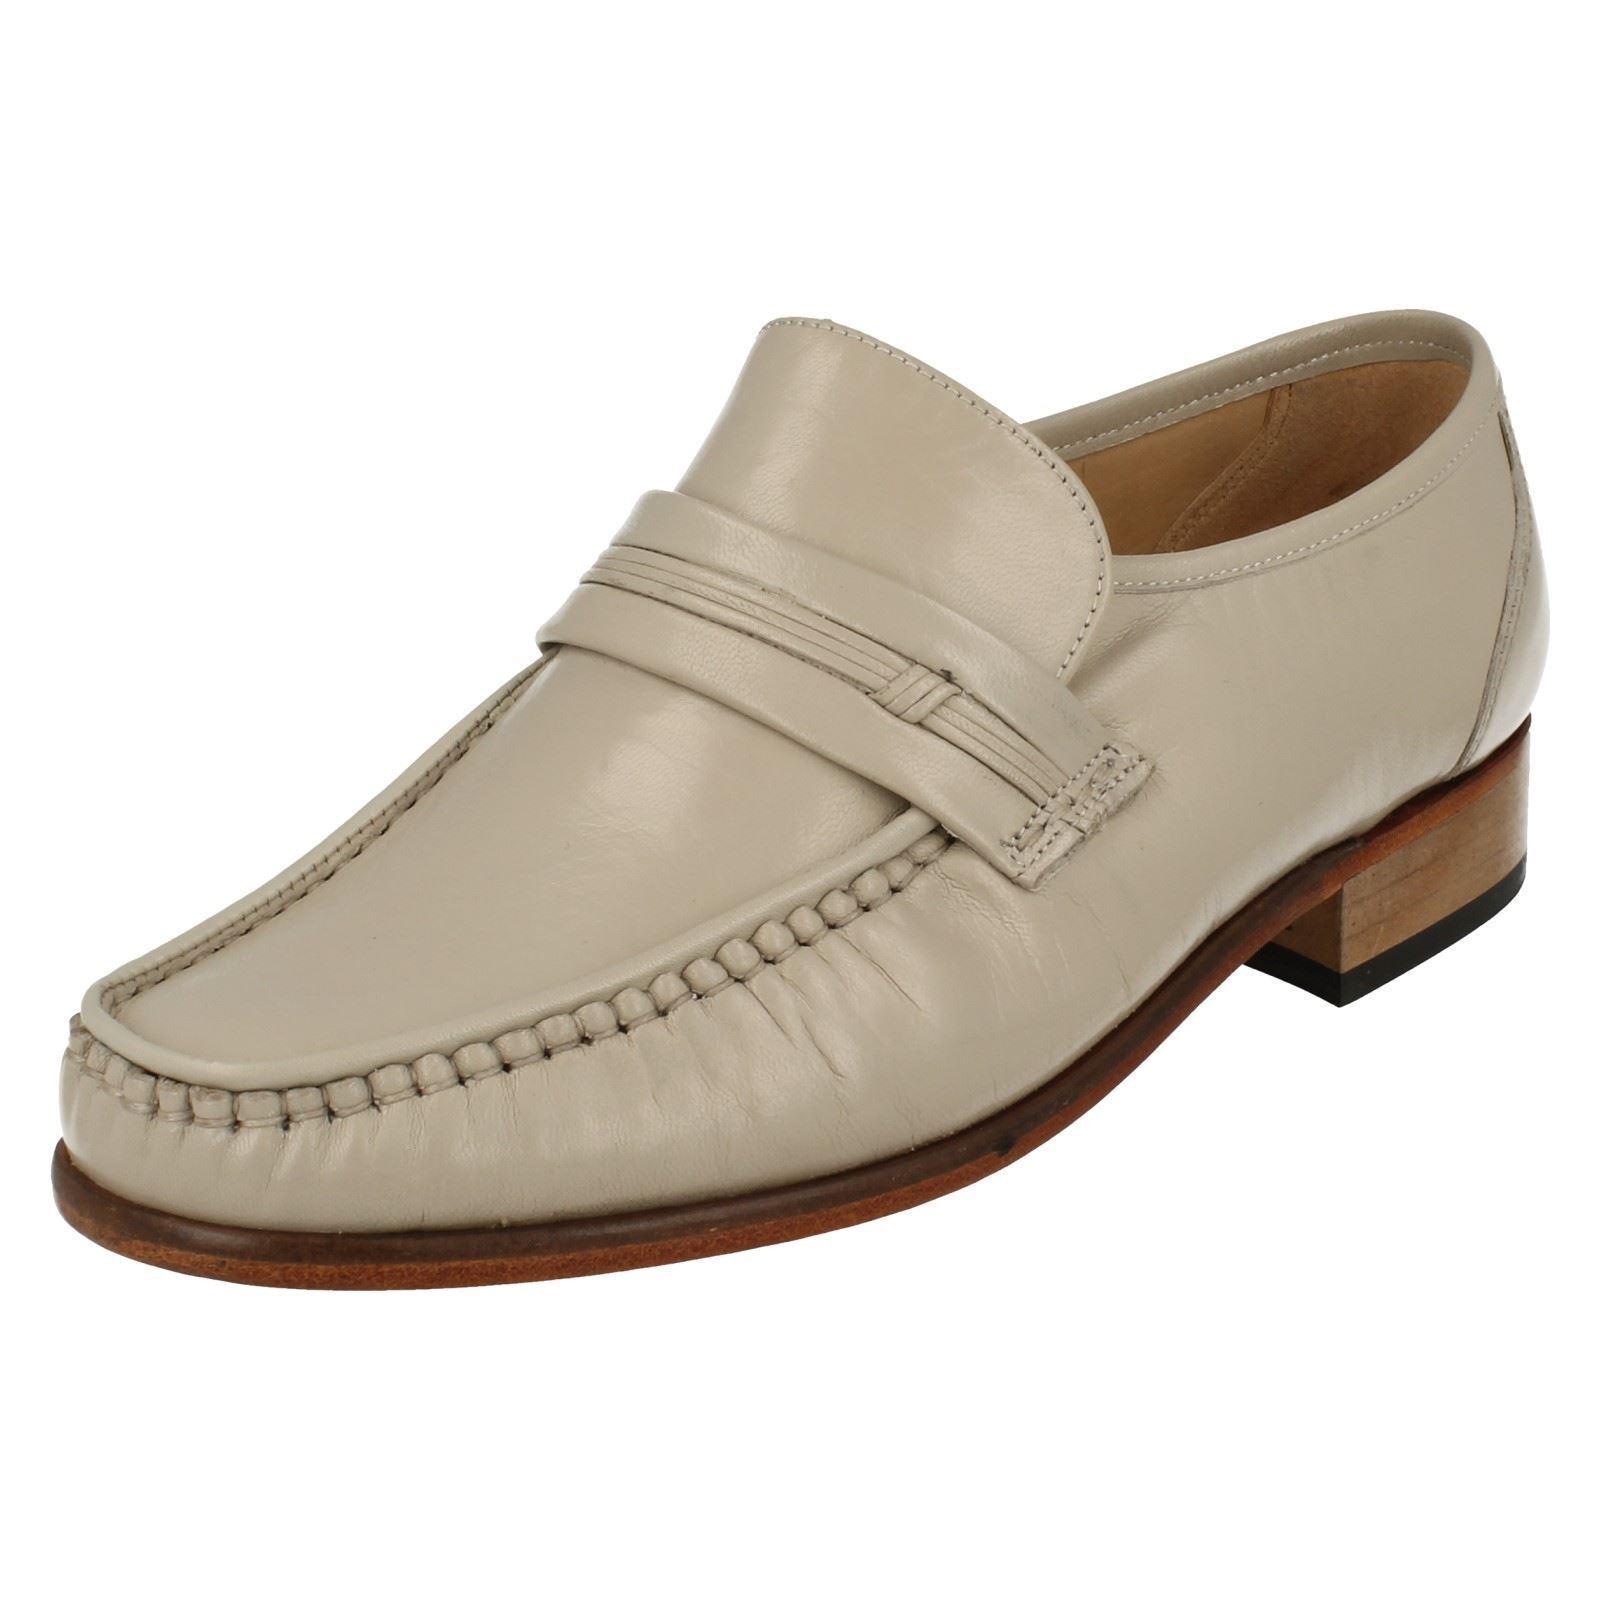 Grenson CLAPHAM 33342-78 Mens Ivory Leather Slip-on shoes (38A) (Kett)